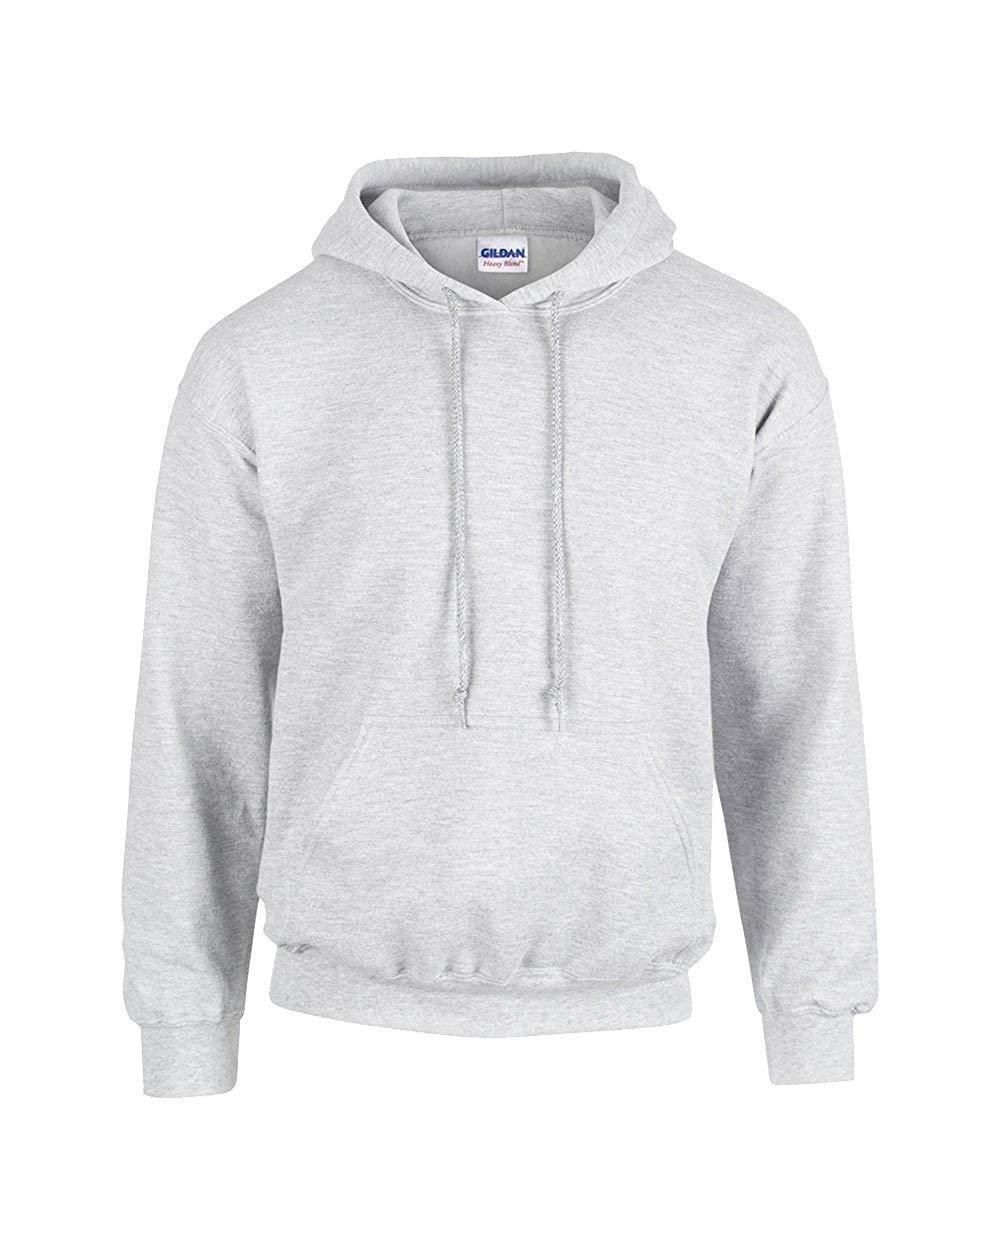 7365d1f9295c Gildan G185 Heavy Blend Adult Hooded Sweatshirt